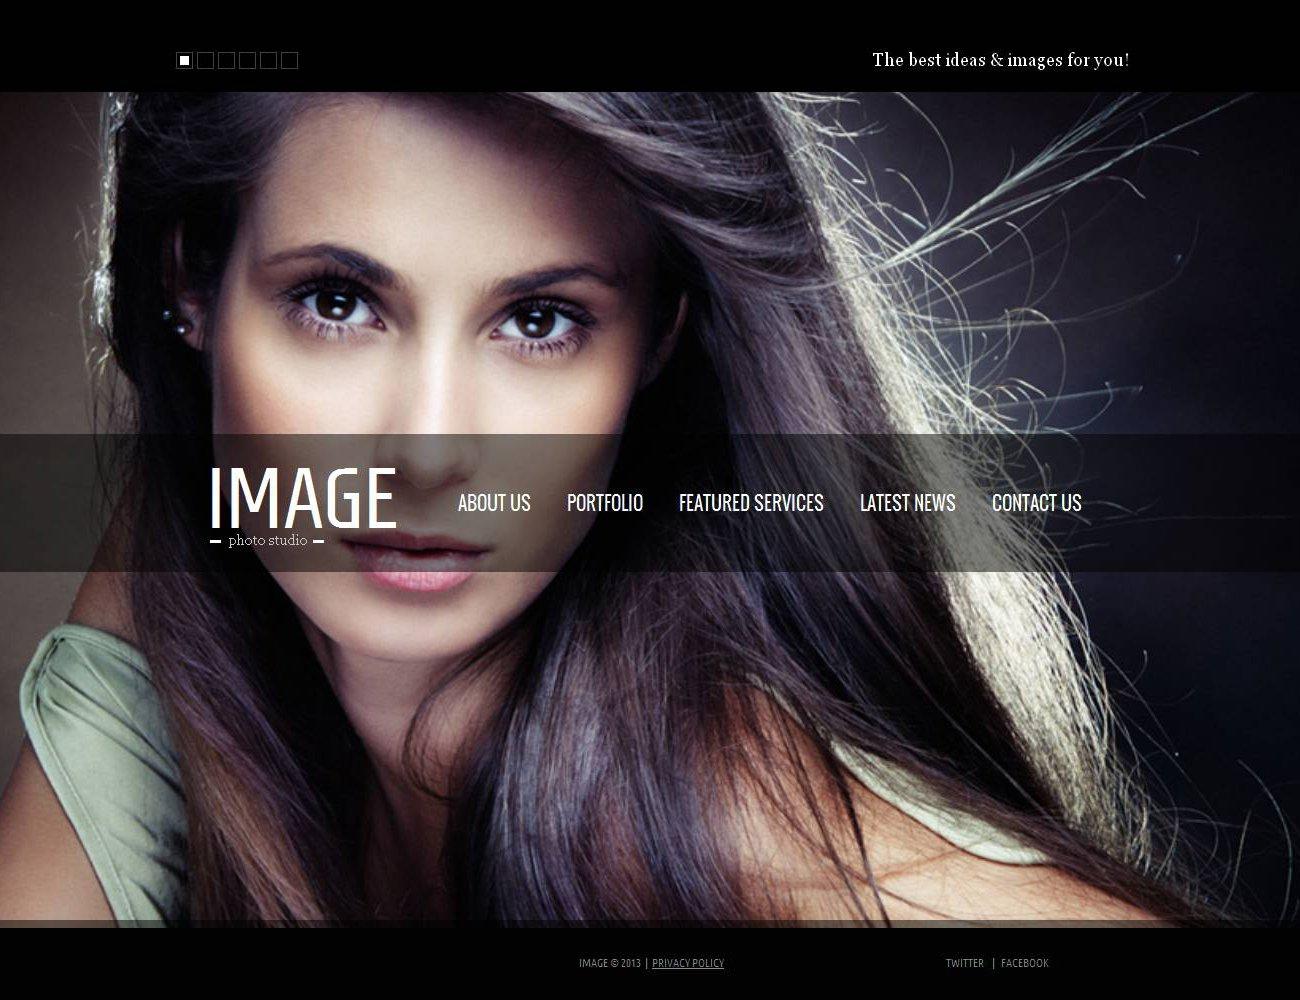 Template de Galeria de Fotos para Sites de Estúdio Fotográfico №44318 - captura de tela